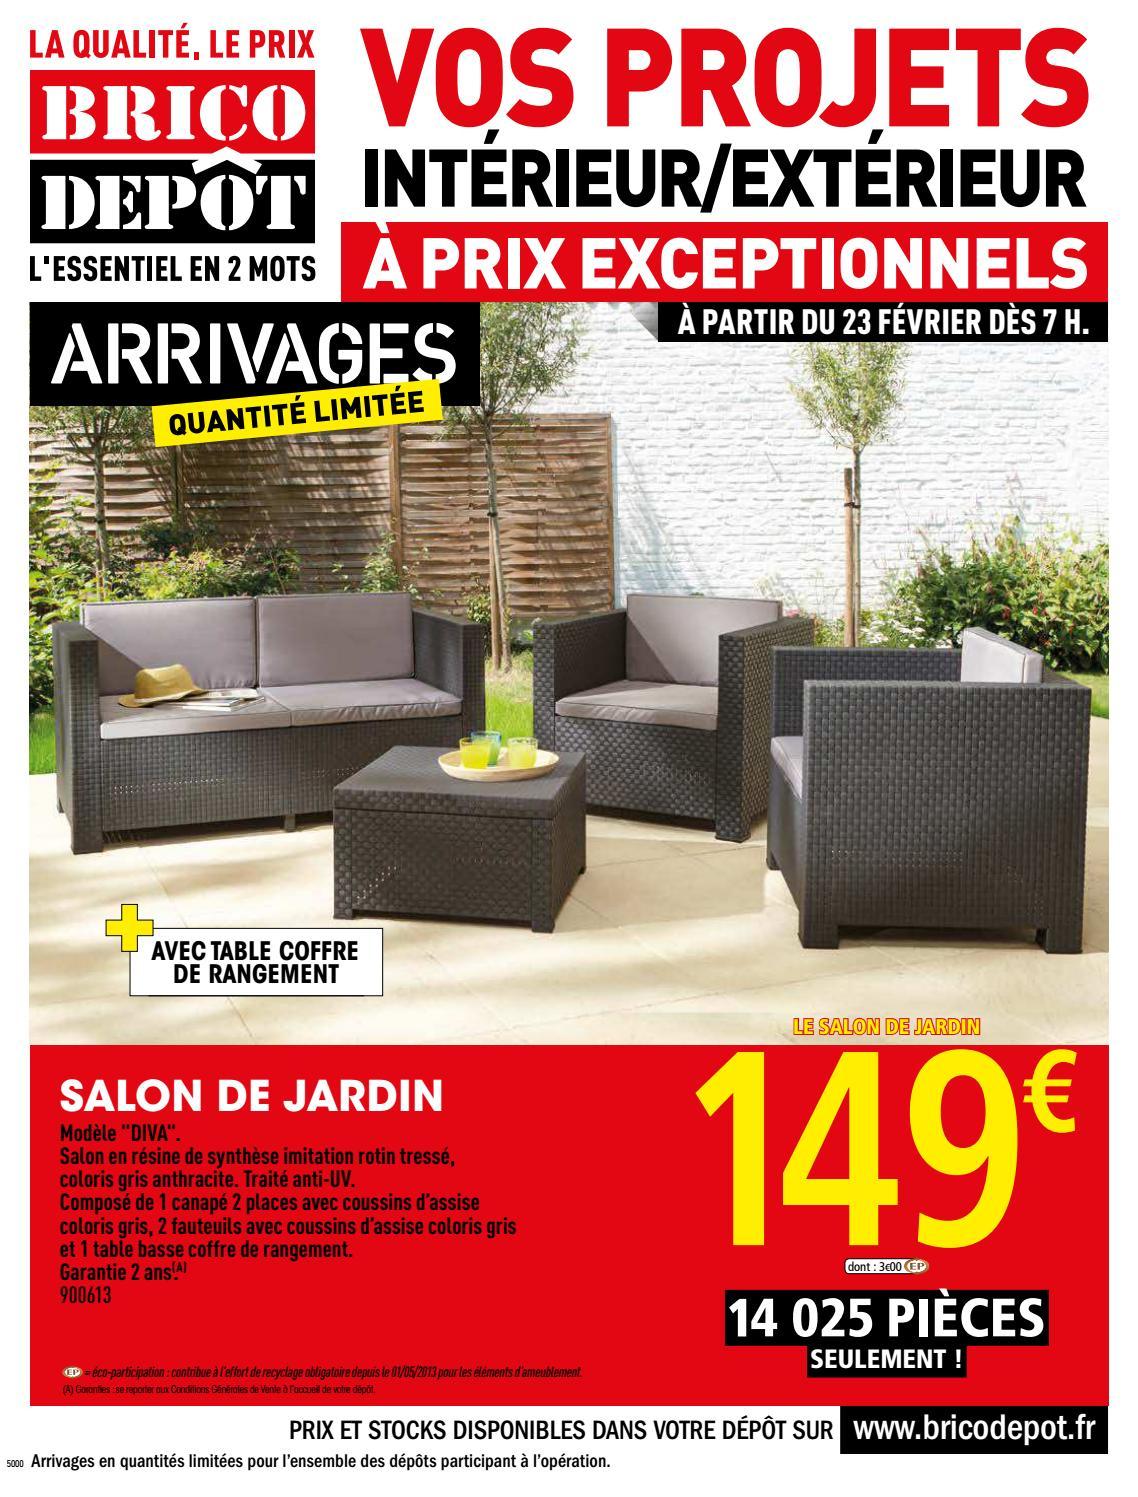 Dep230218 1 By Jan Deo - Issuu concernant Pompe Piscine Brico Depot